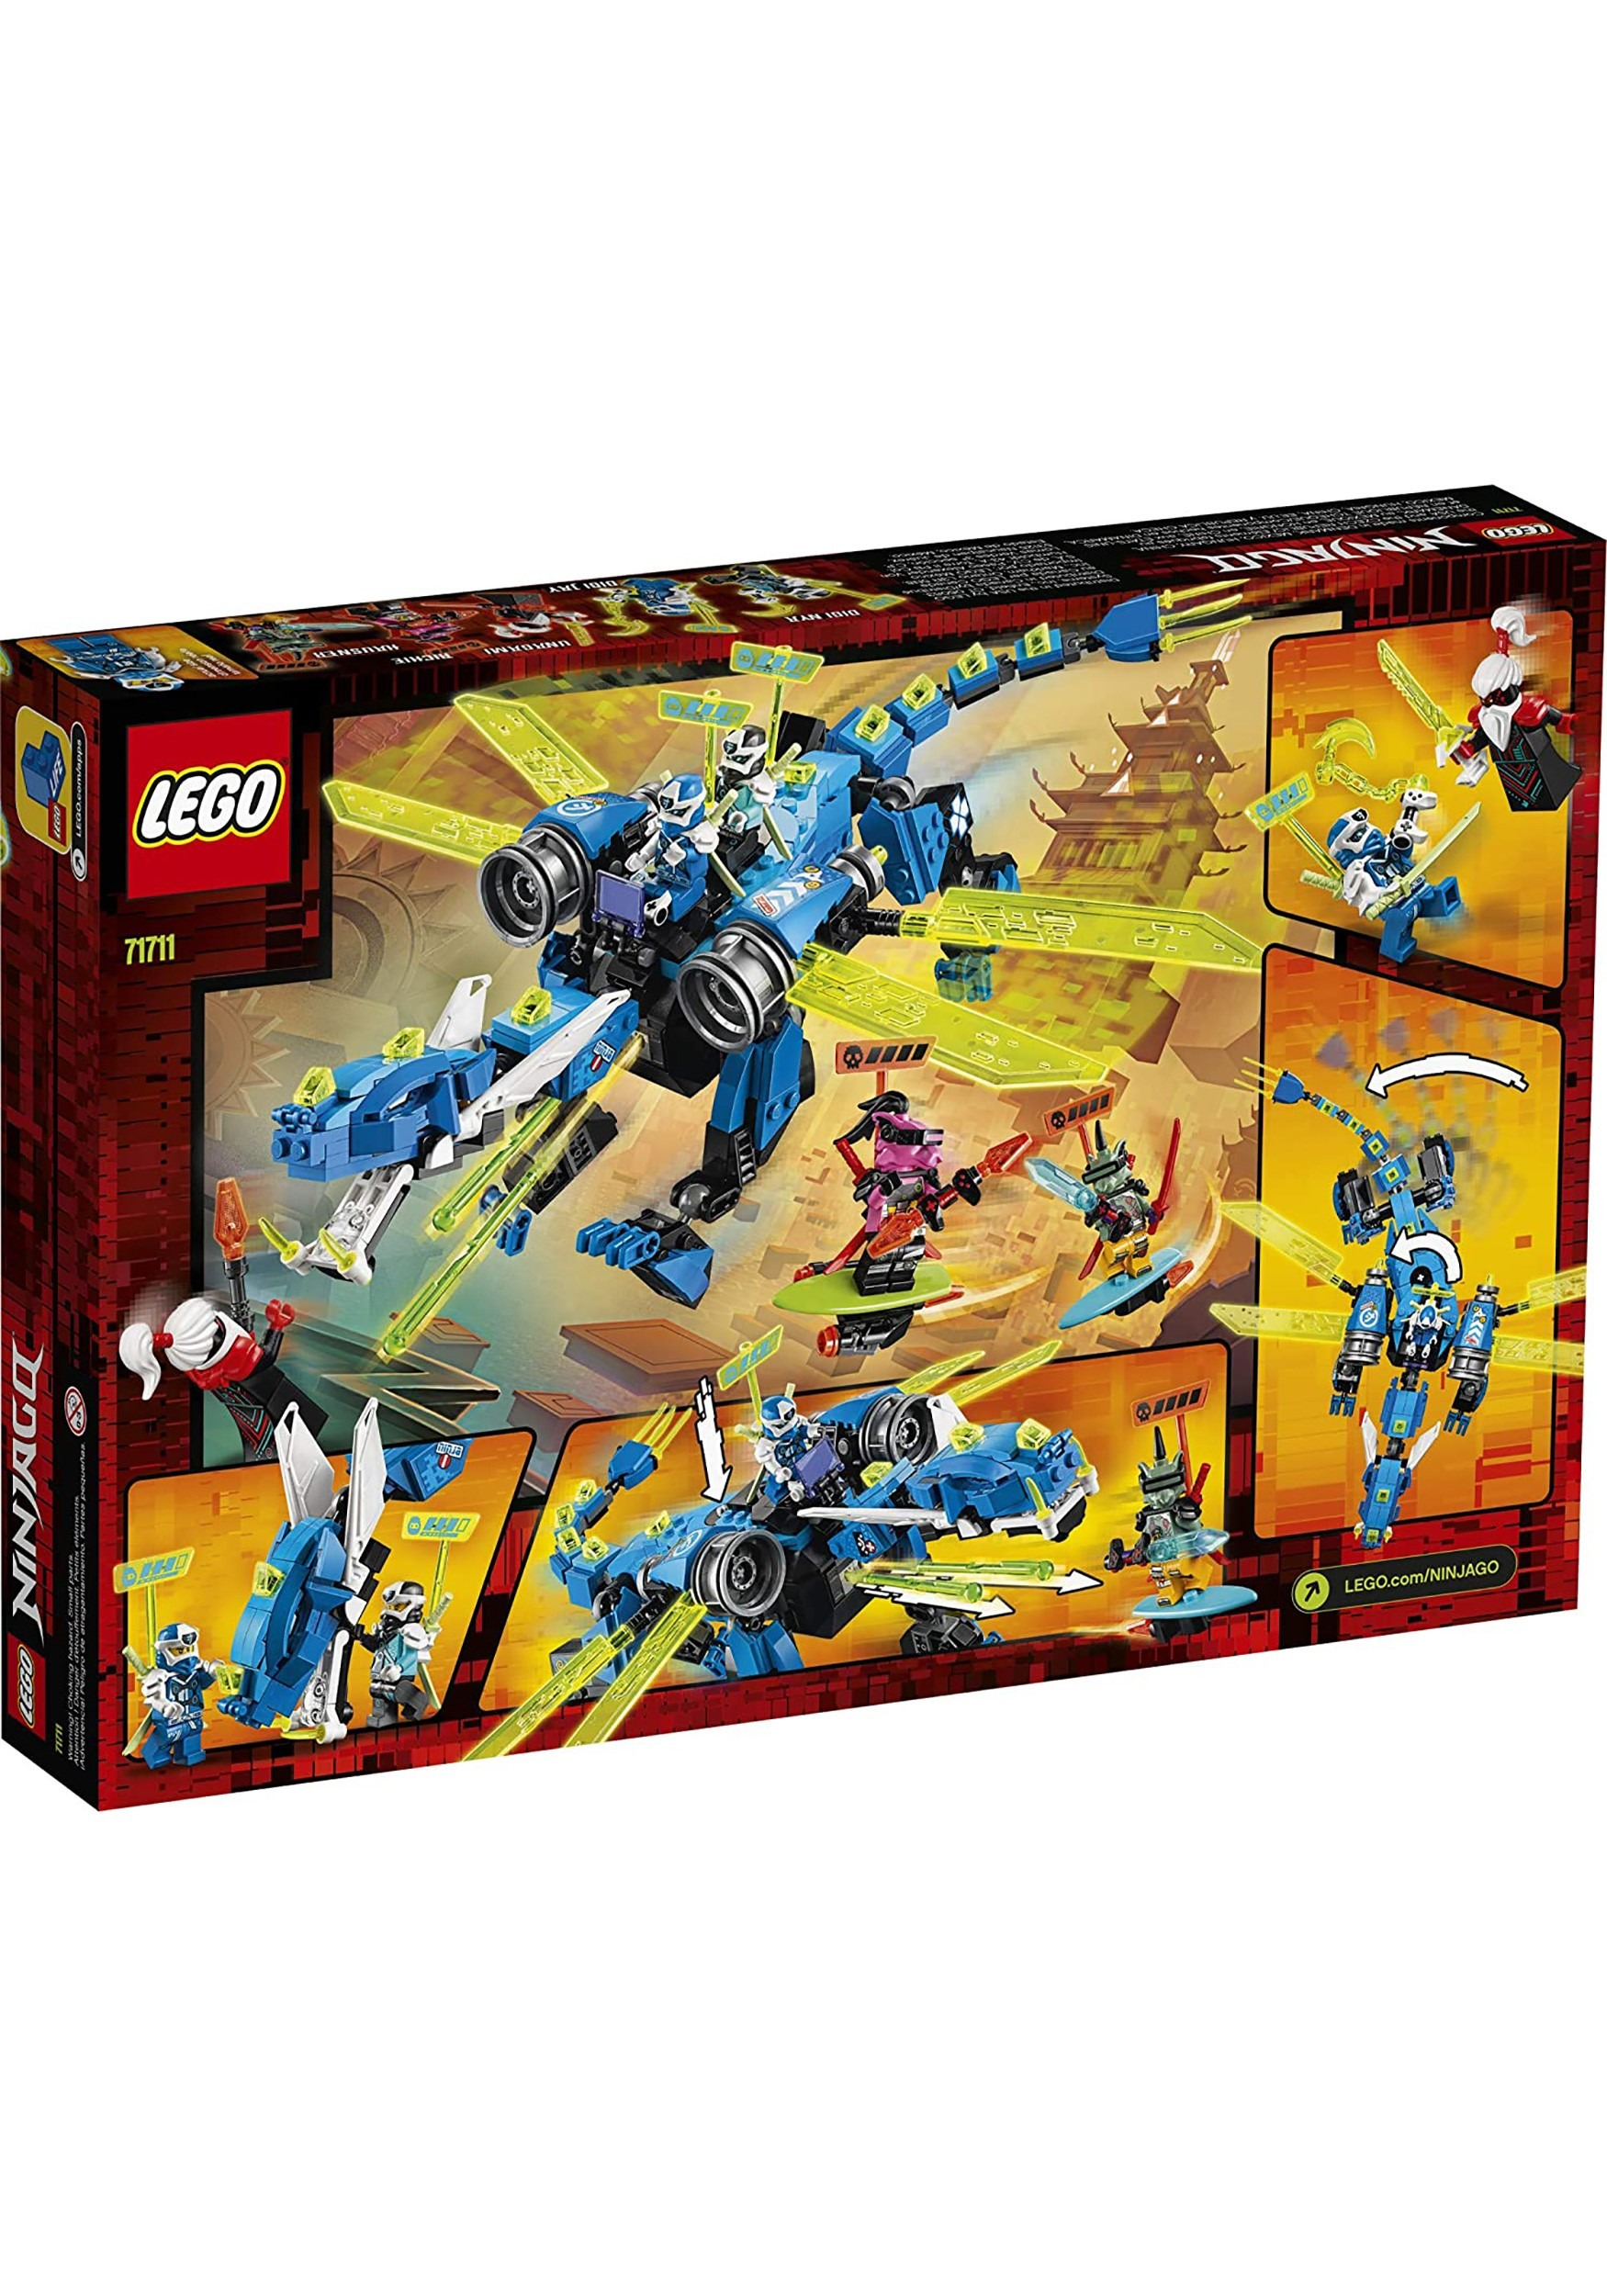 Jay's Cyber Dragon LEGO Ninjago building set